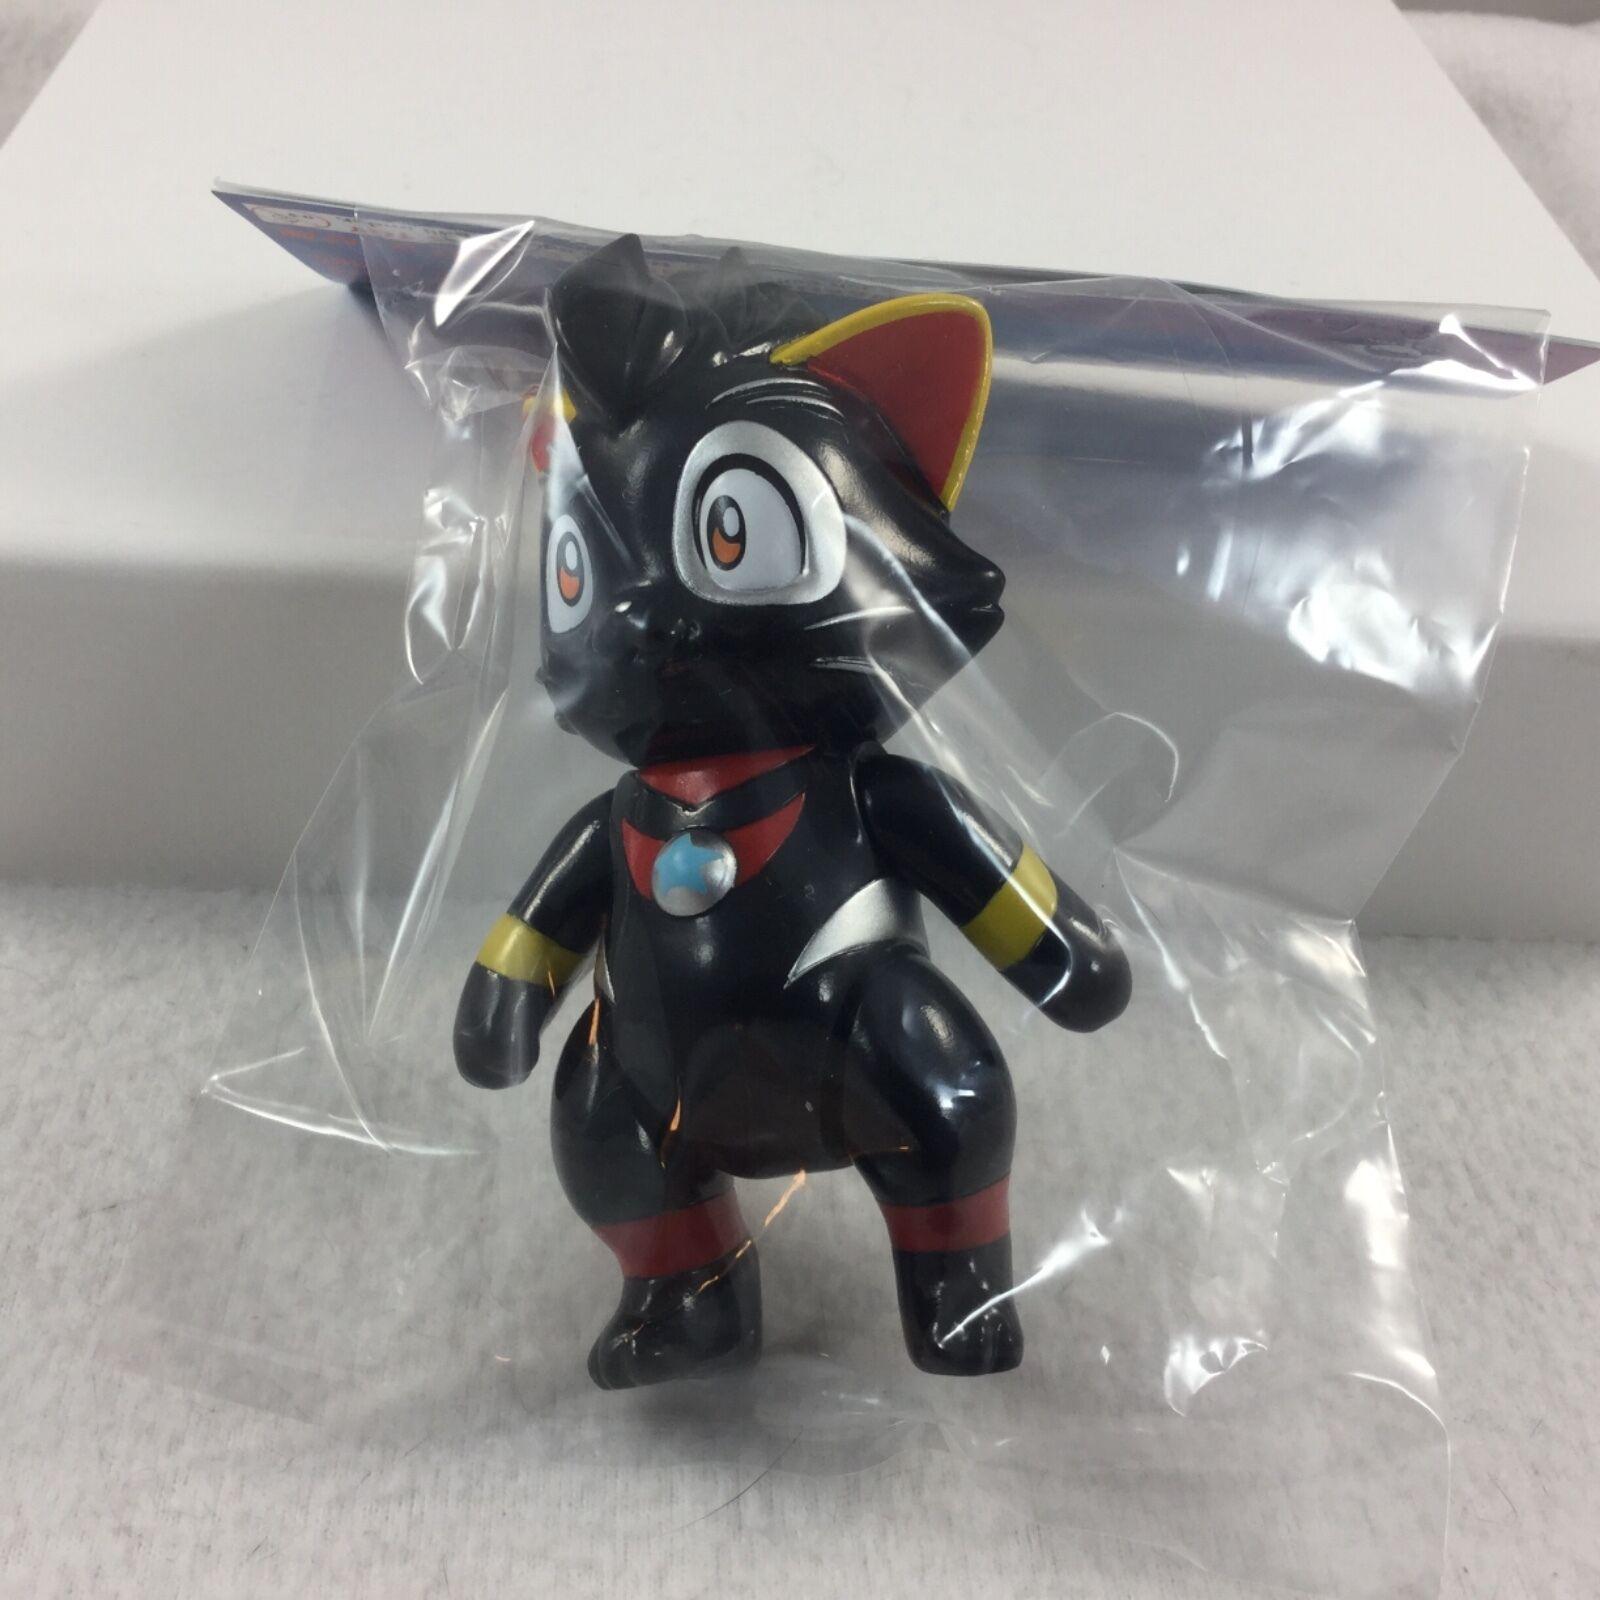 Max Juguete Vinilo Ultra Nyan Dark Estrella Co Gato Marca Nagata Yoshihiko Makino 4.75  Nuevo en Paquete